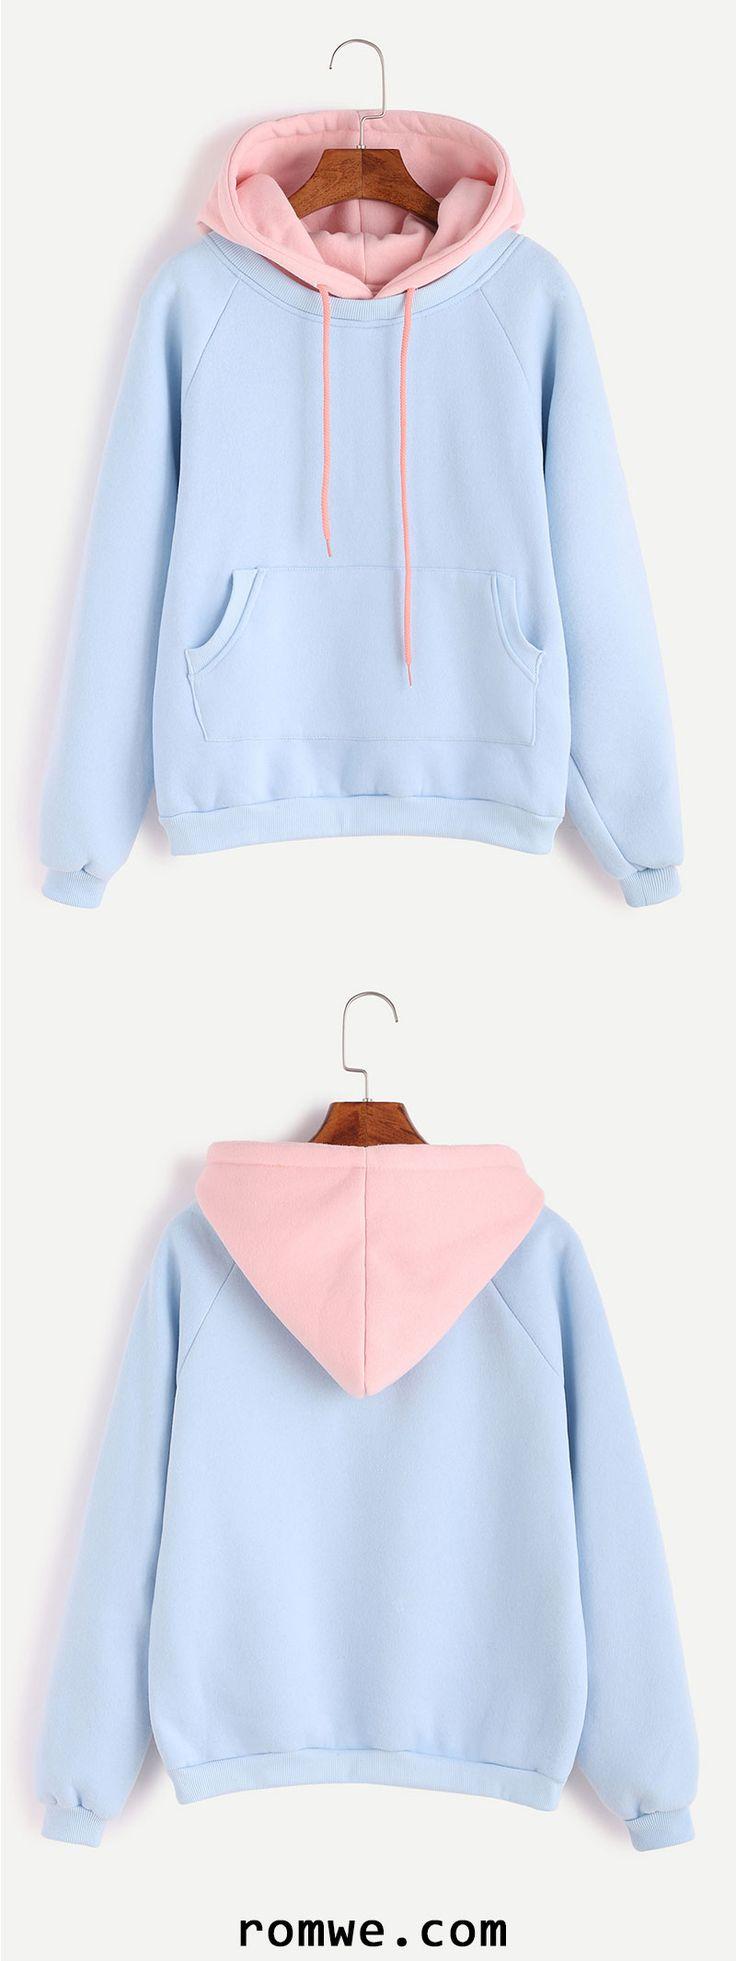 Light Blue Raglan Sleeve Contrast Hood 2 In 1 Sweatshirt